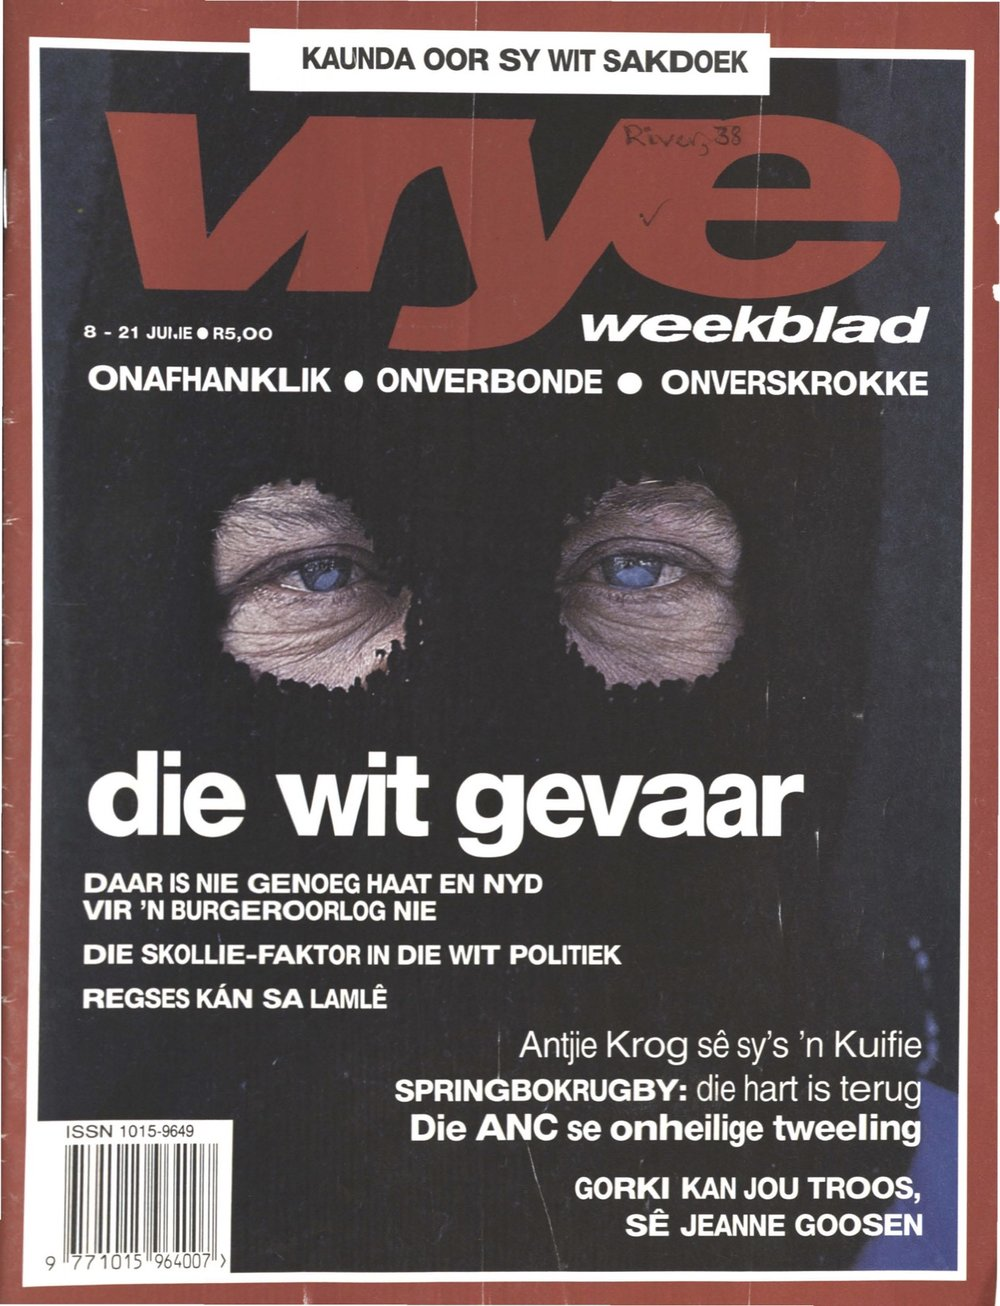 vw_1993-07-08-21.jpg